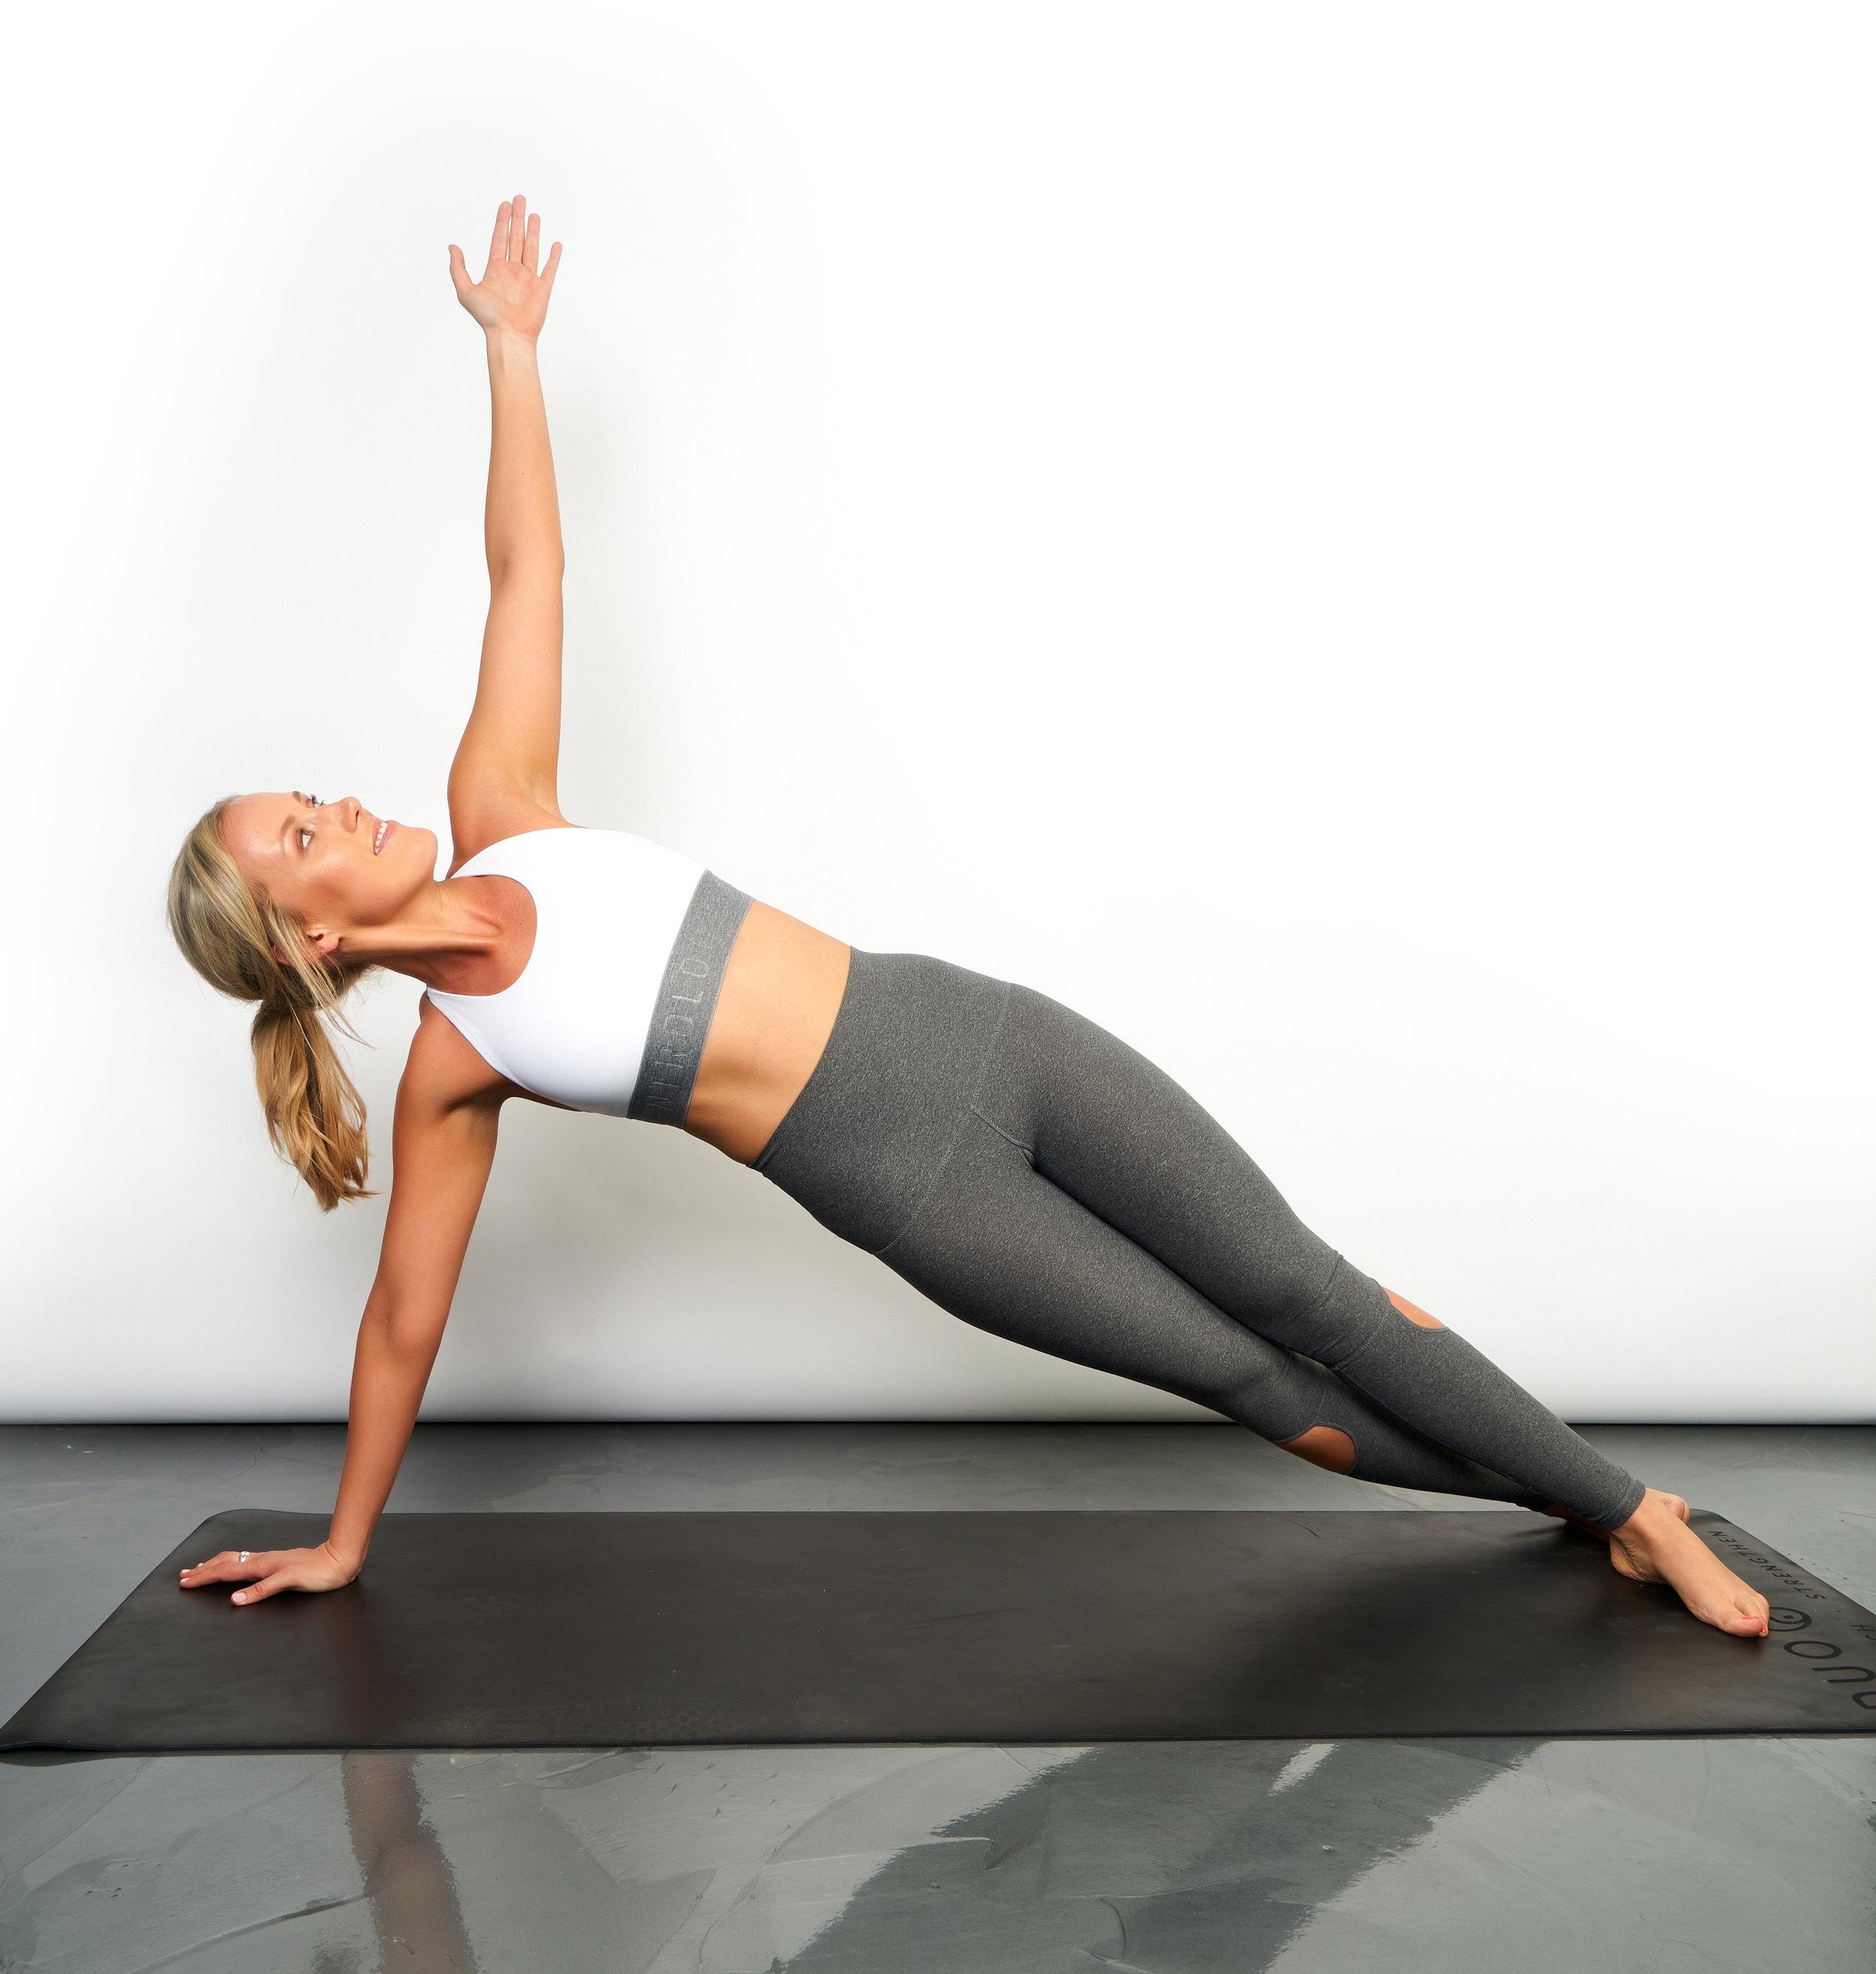 Sunken hips- common mistakes of planking